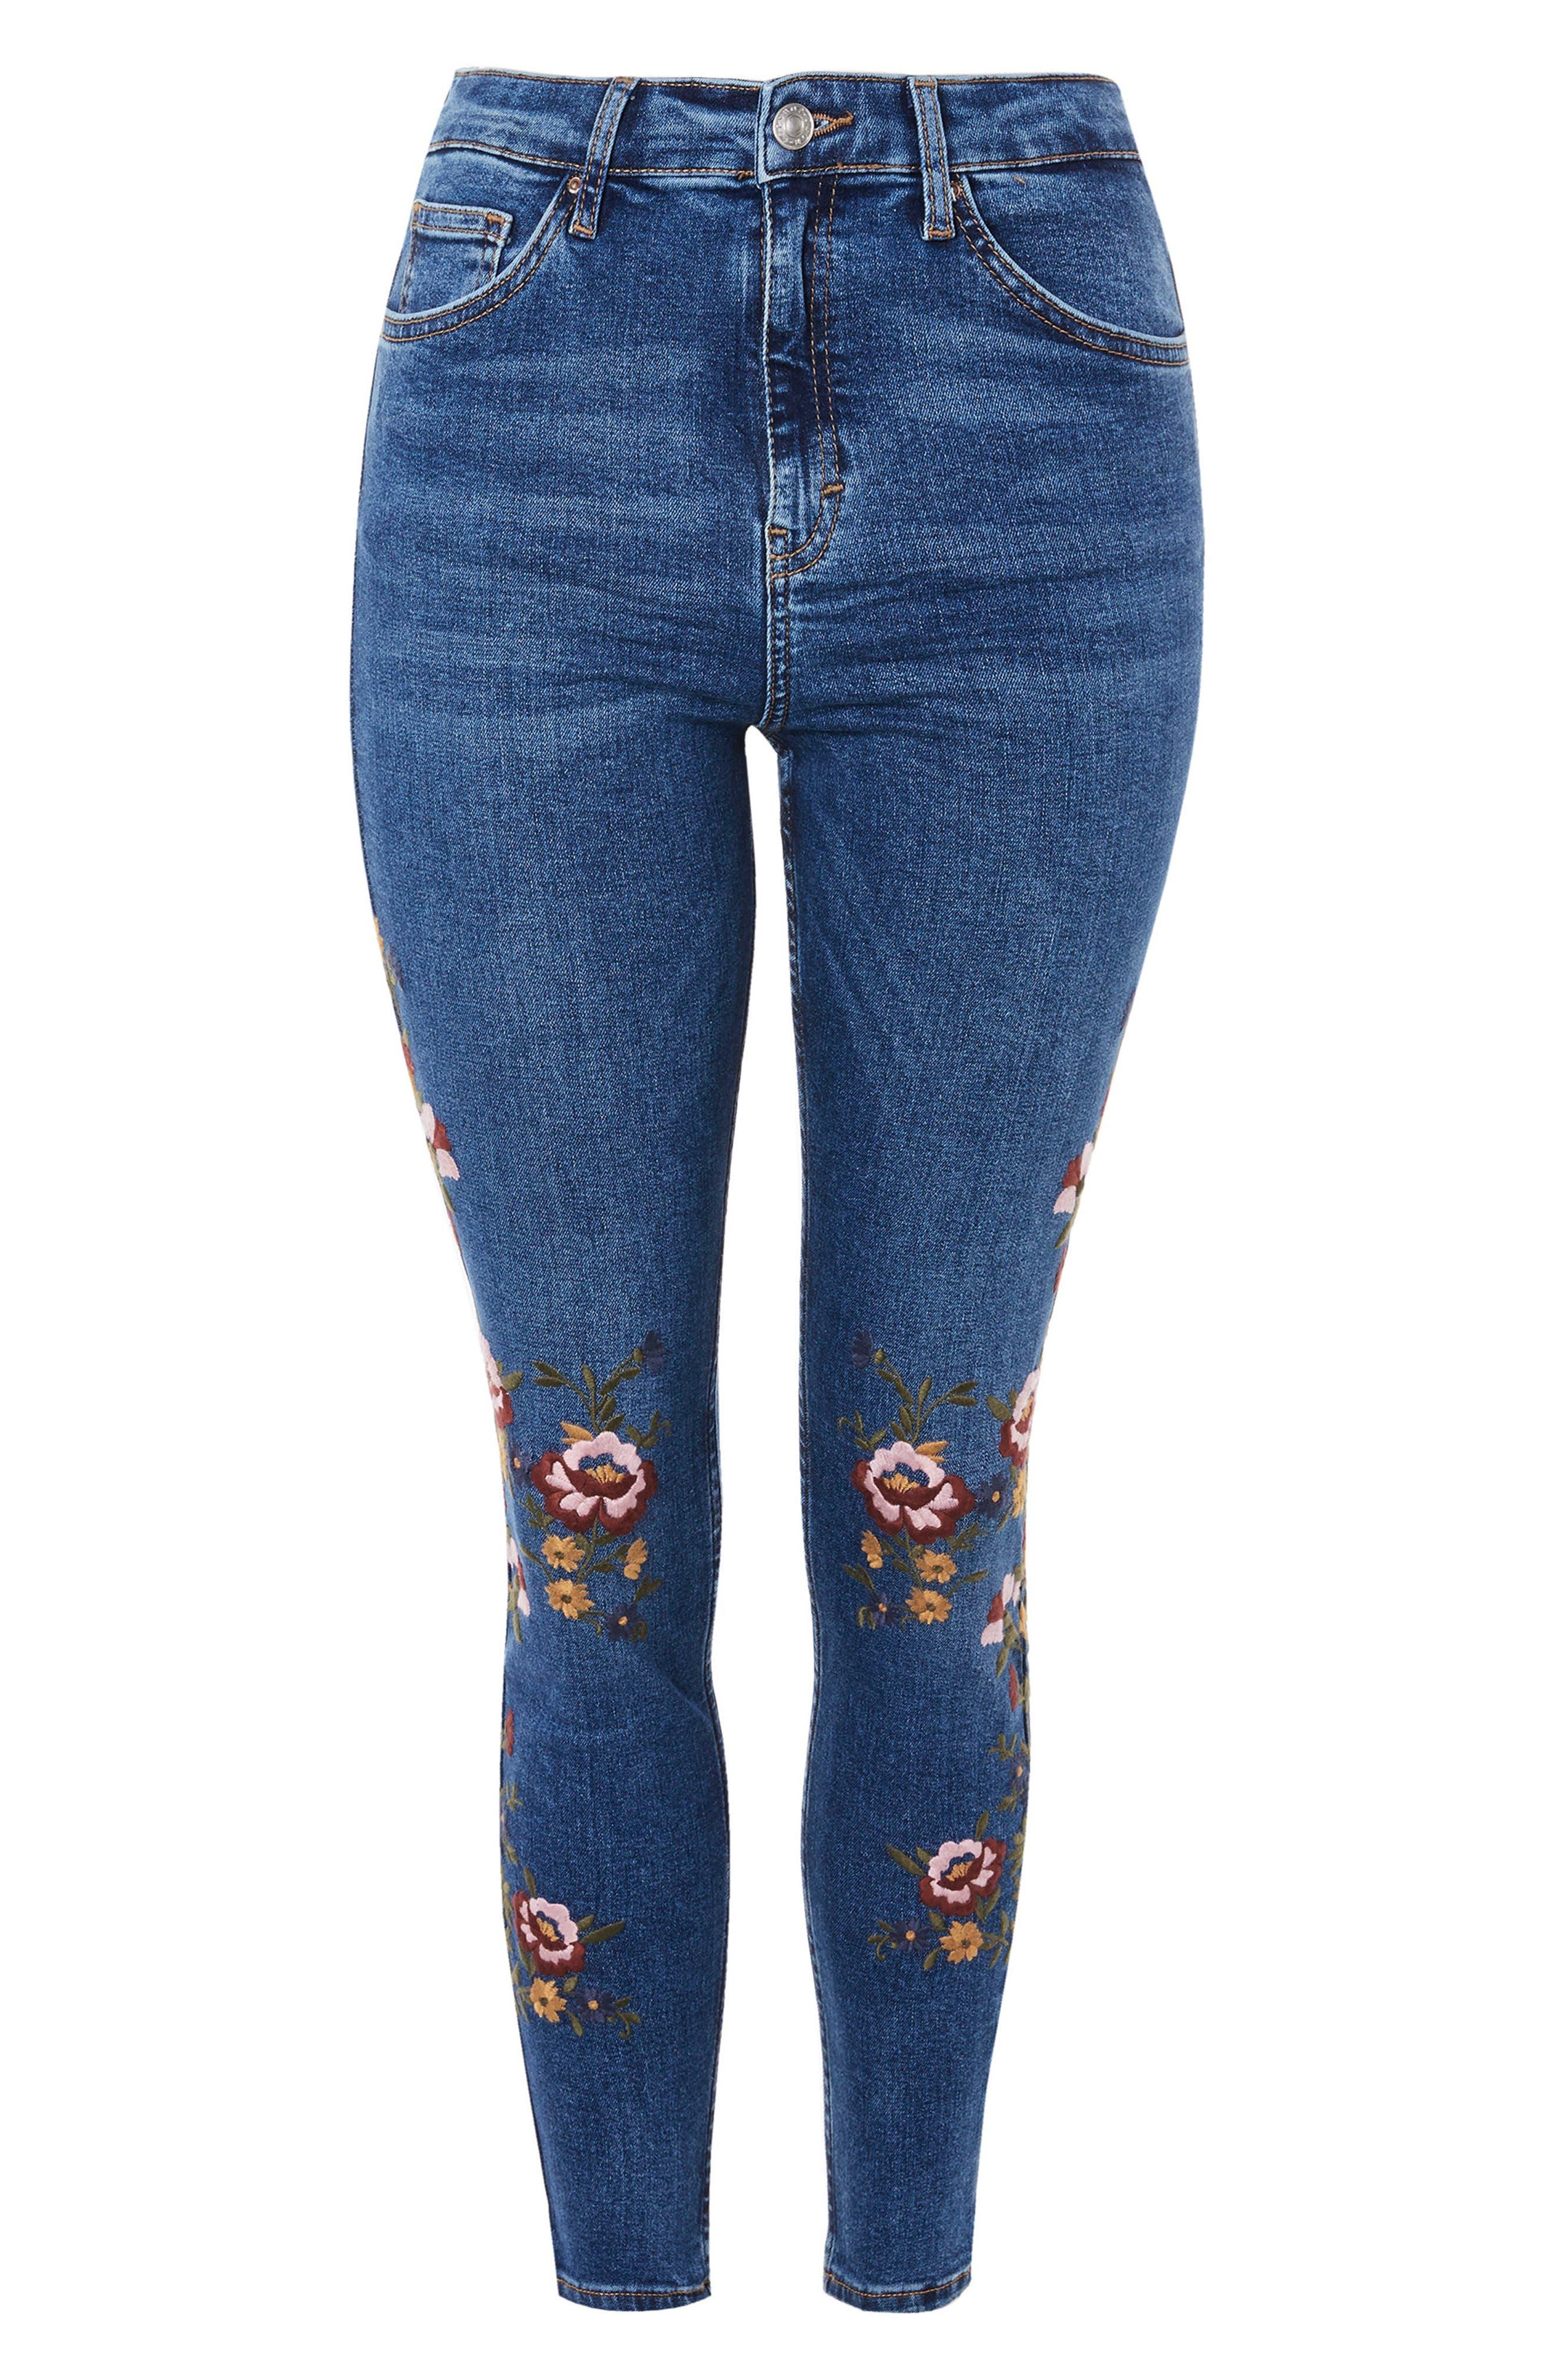 Jamie Ditsy Floral Jeans,                             Alternate thumbnail 4, color,                             Mid Denim Multi